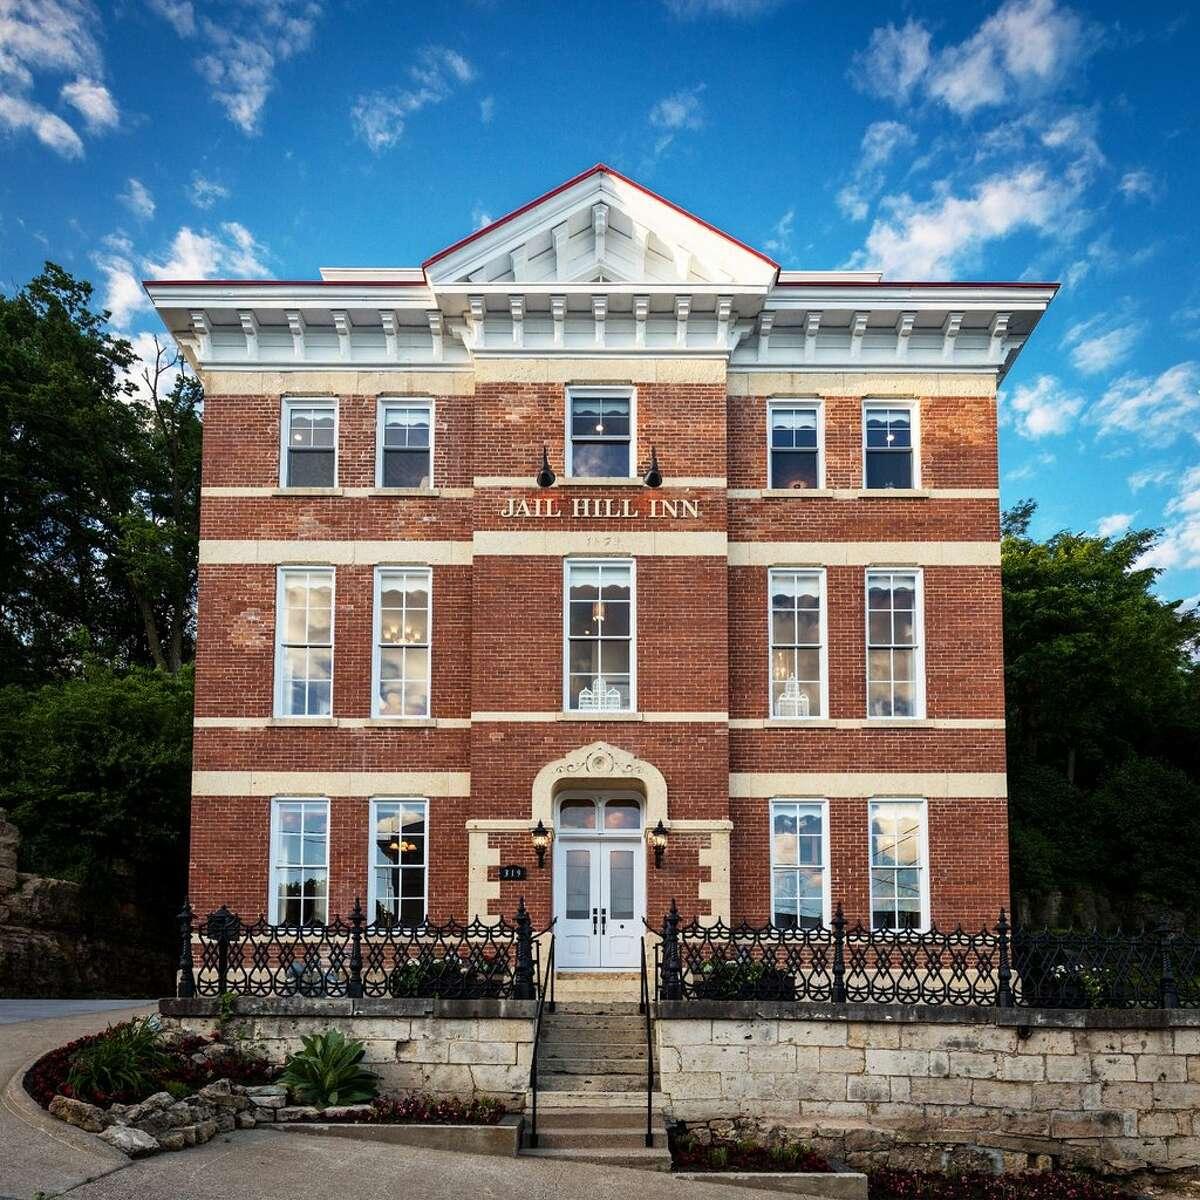 Best B&B orInn Winner: Jail Hill Inn Where: Galena, Illinois Average price: $379 pernight